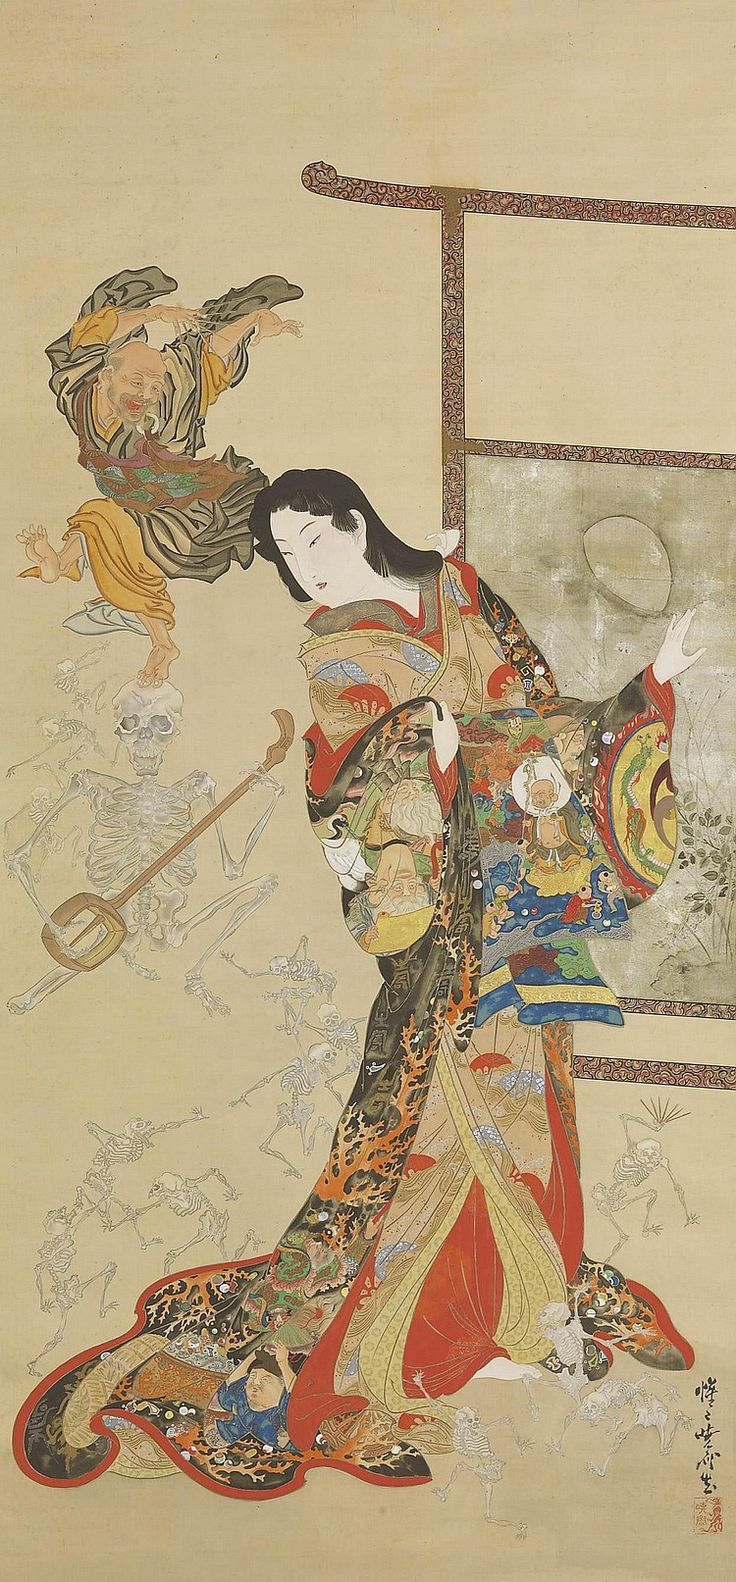 KAWANABE Kyosai (1831-1889), Japan 河鍋 暁斎